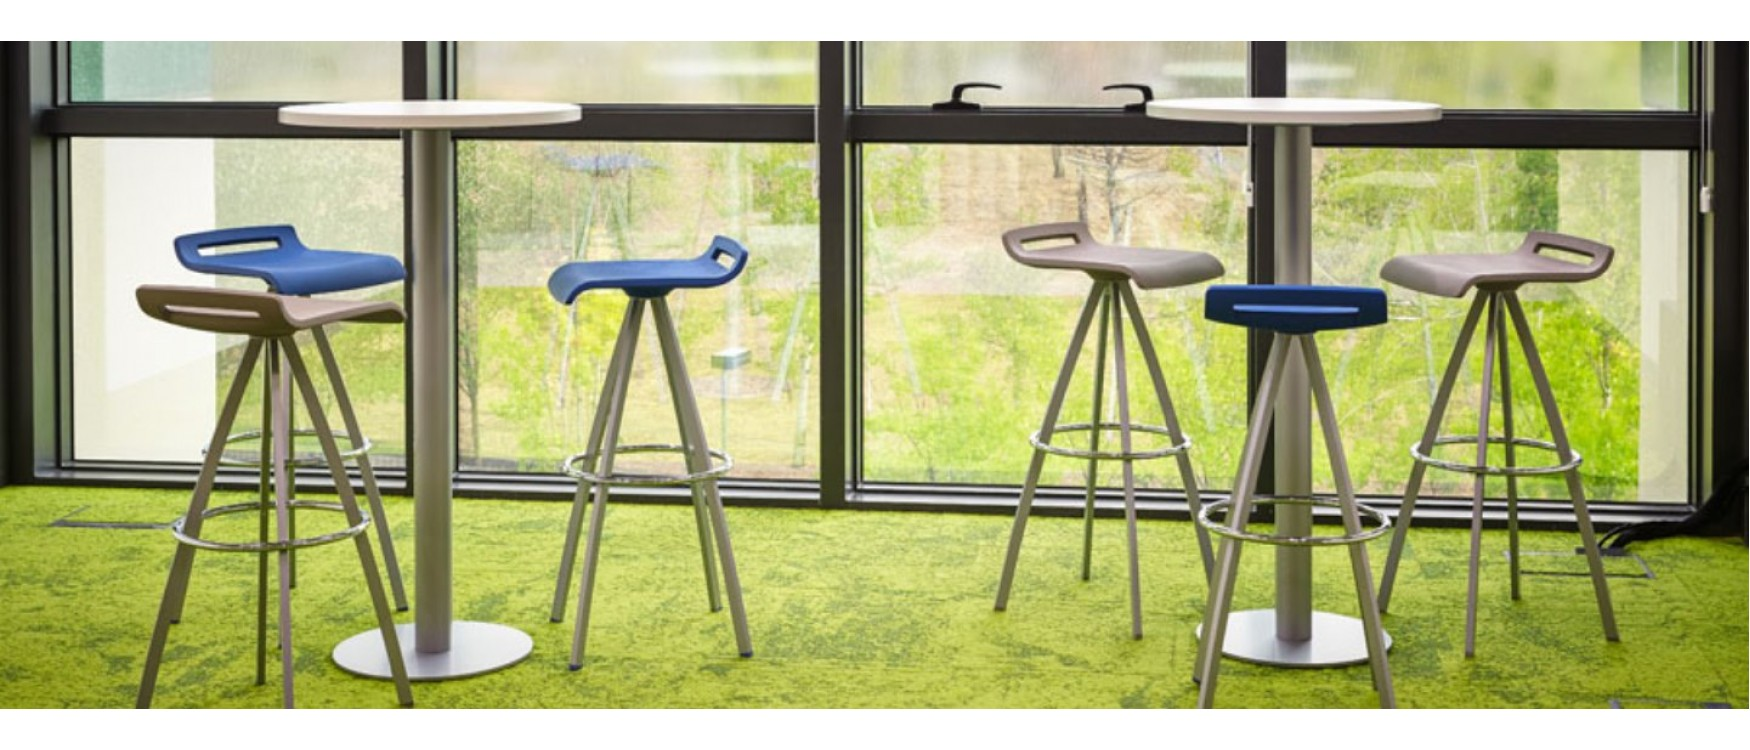 Mobiliario de oficina online finest mobiliario de oficina for Mobiliario de oficina online